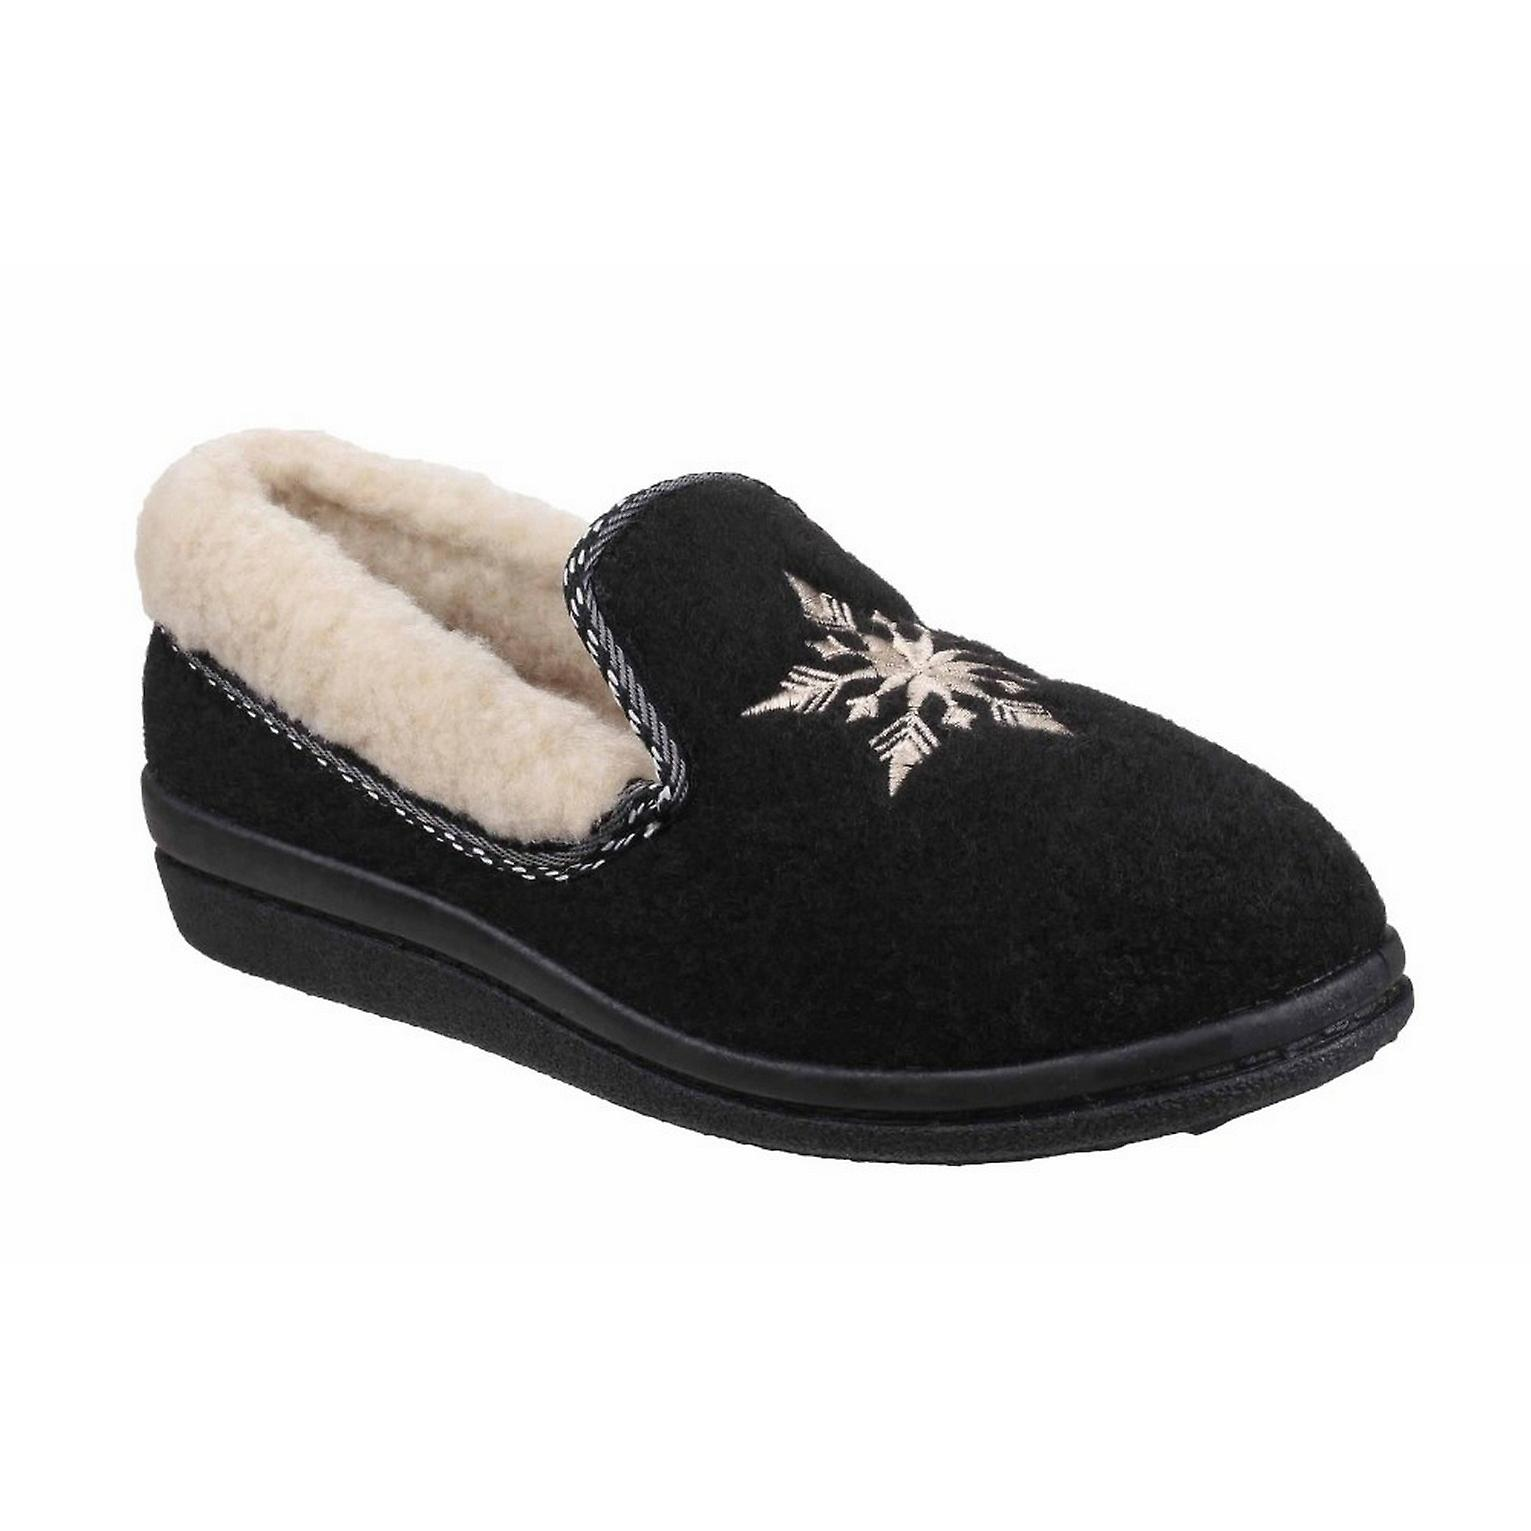 Mirak Womens/Ladies Snowflake Slippers